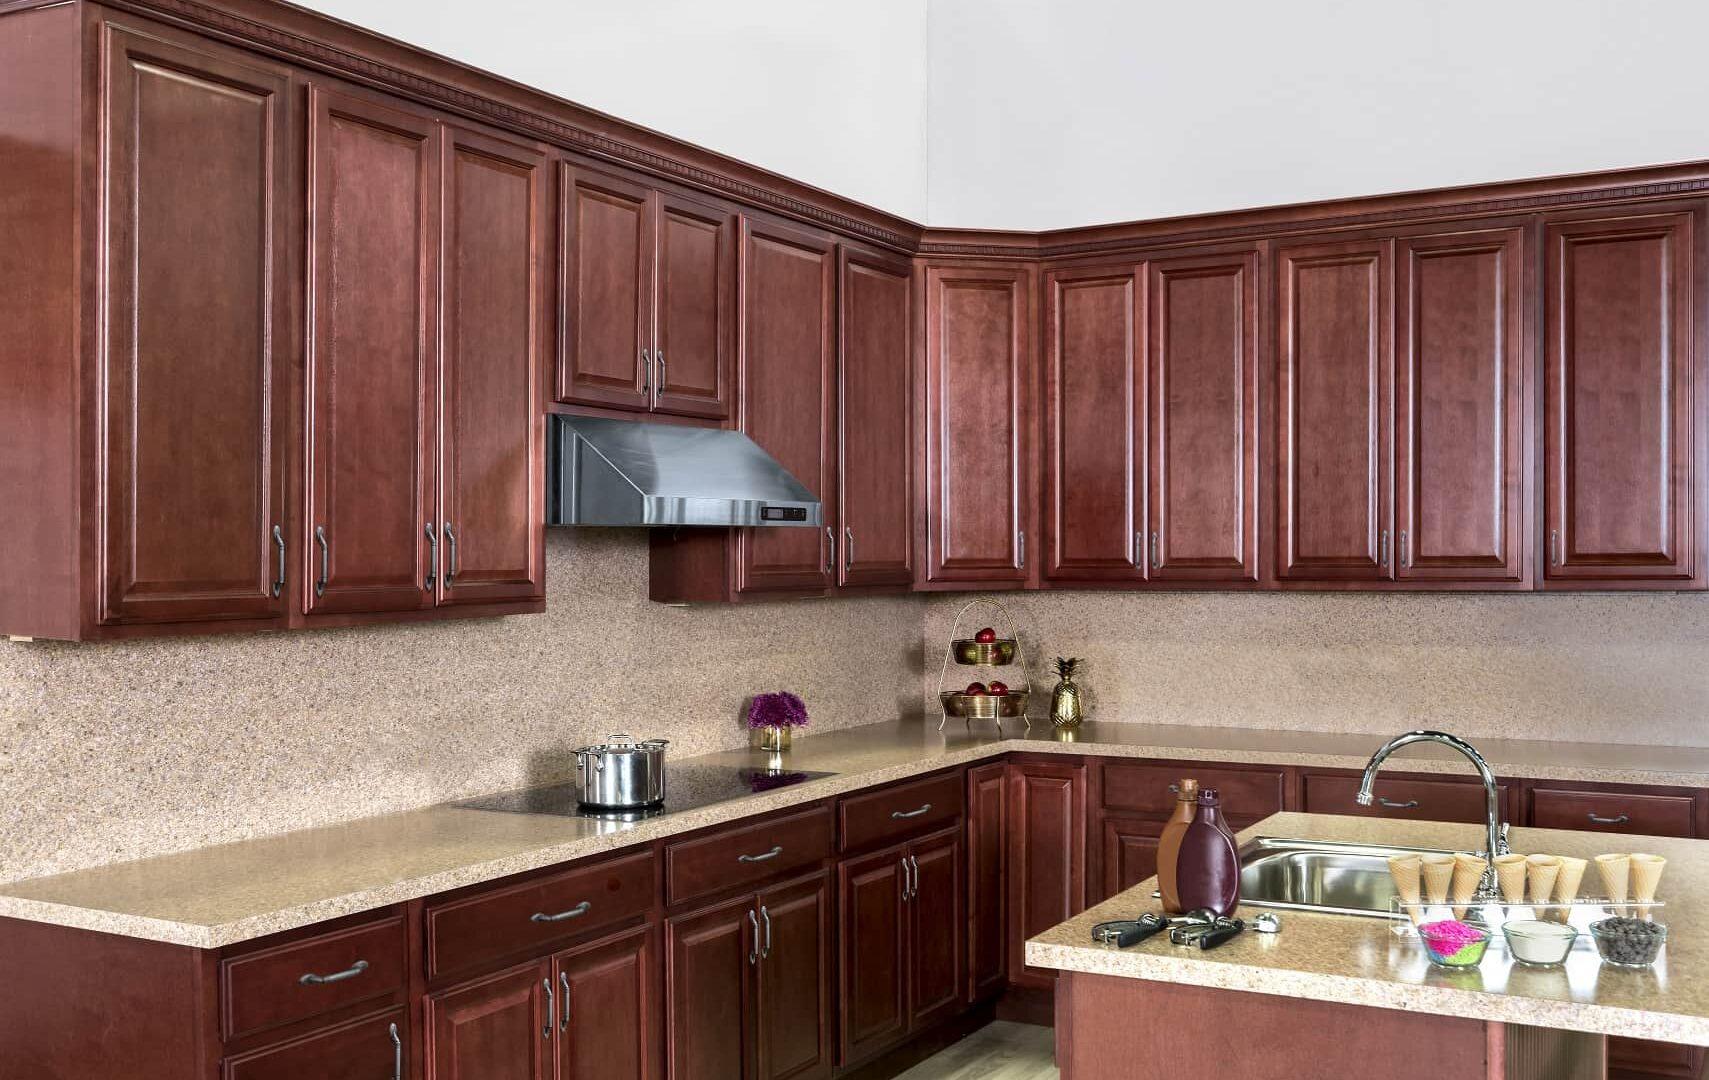 Kitchen Design, Kitchen Design Models, Kitchen Design Ideas, White, Transitional, Restaurant, Craftsman, Hamptons, Spanish, Large